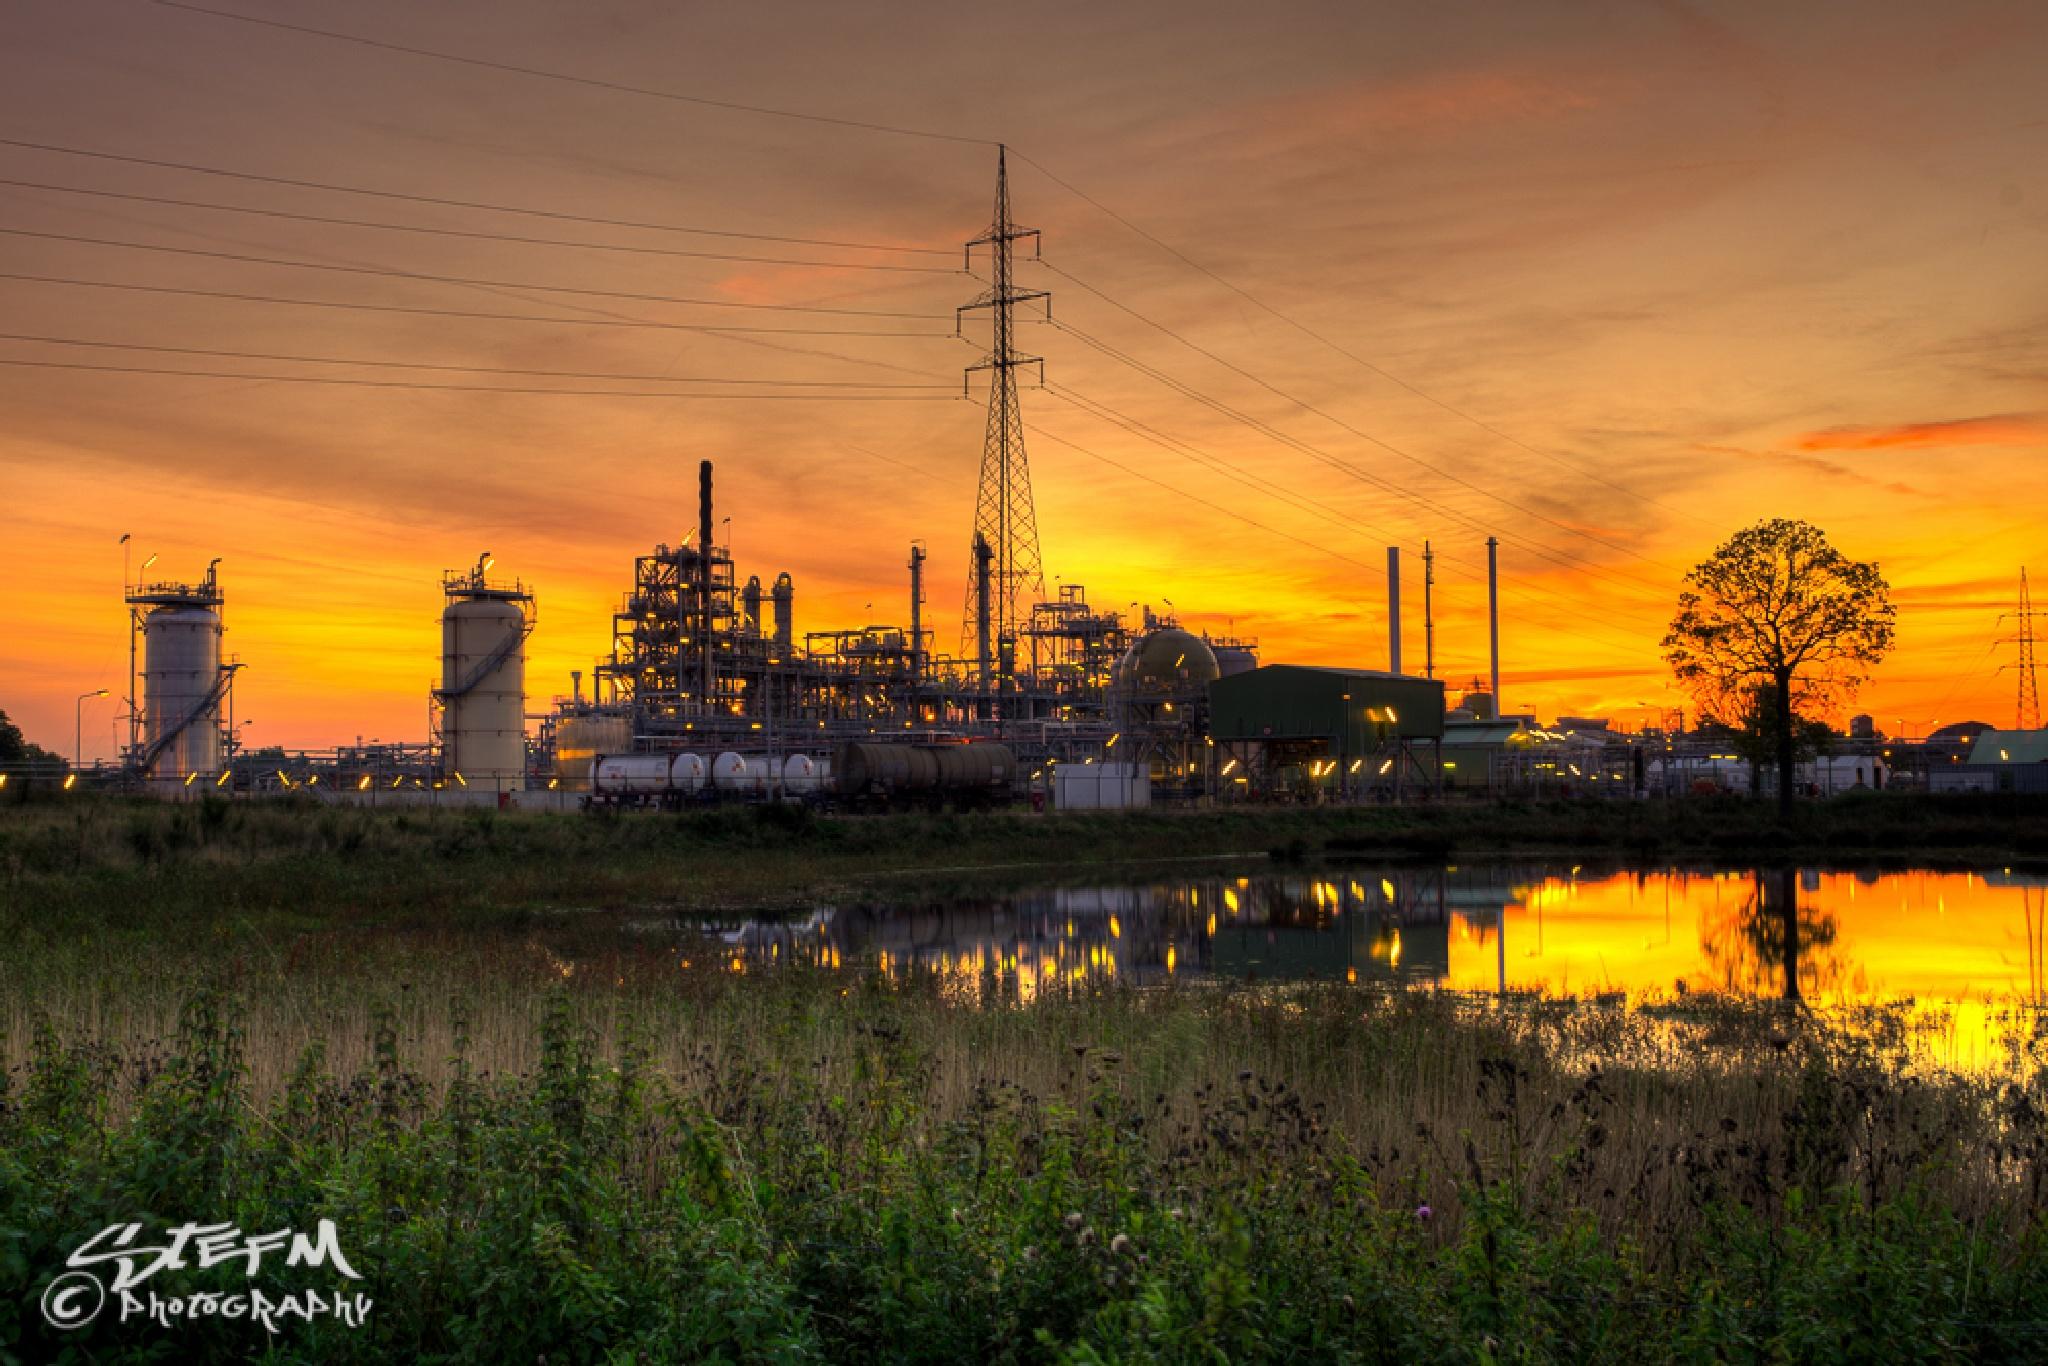 Industrial Sunset by Stefan Meekers